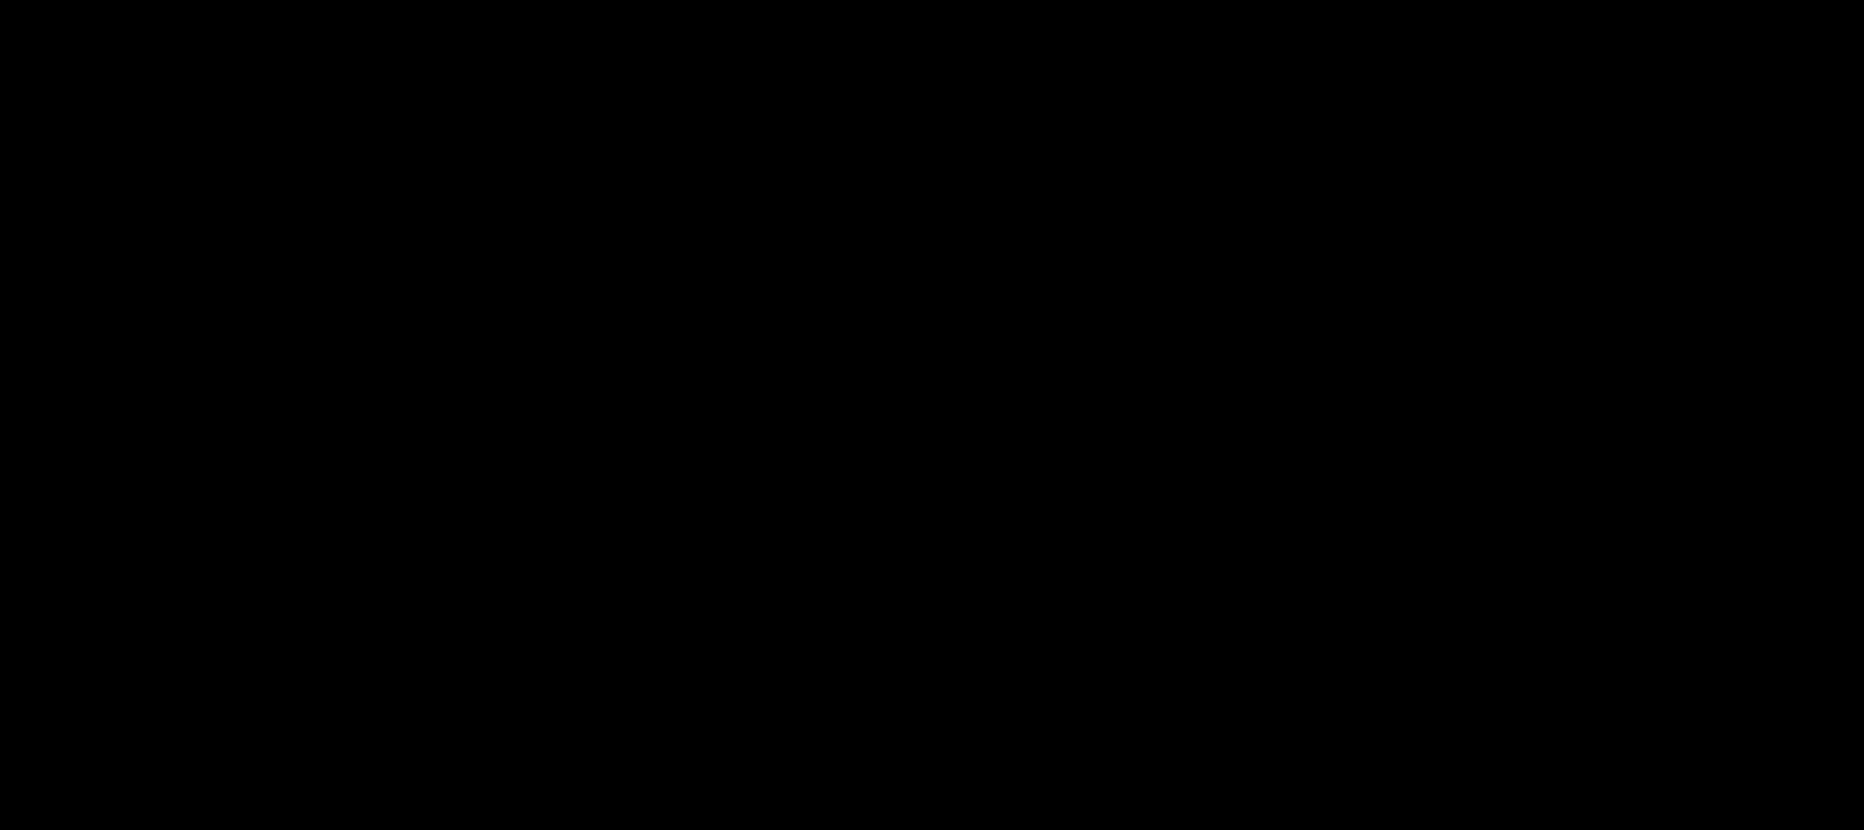 N-(2-(1H-Indol-3-yl)ethyl)-6-Chloro-4-oxo-4H-chromene-2-carboxamide